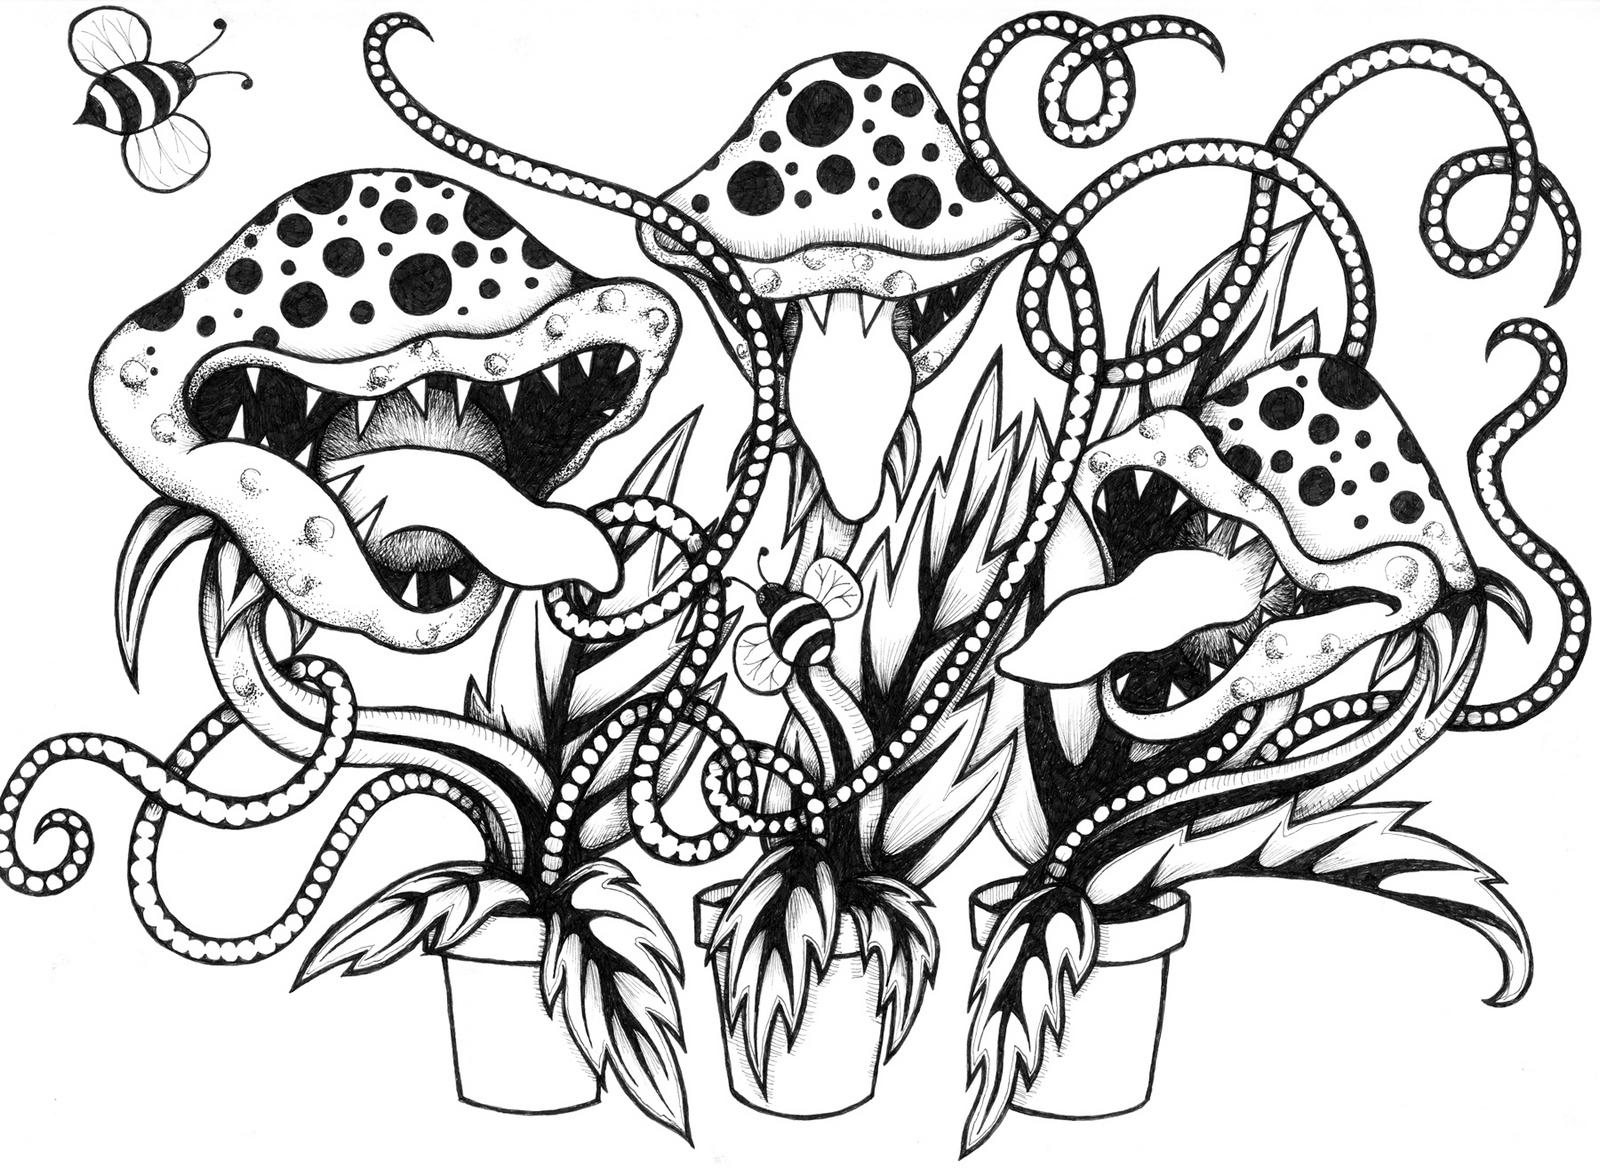 venus fly trap carnivorous plant coloring sheet